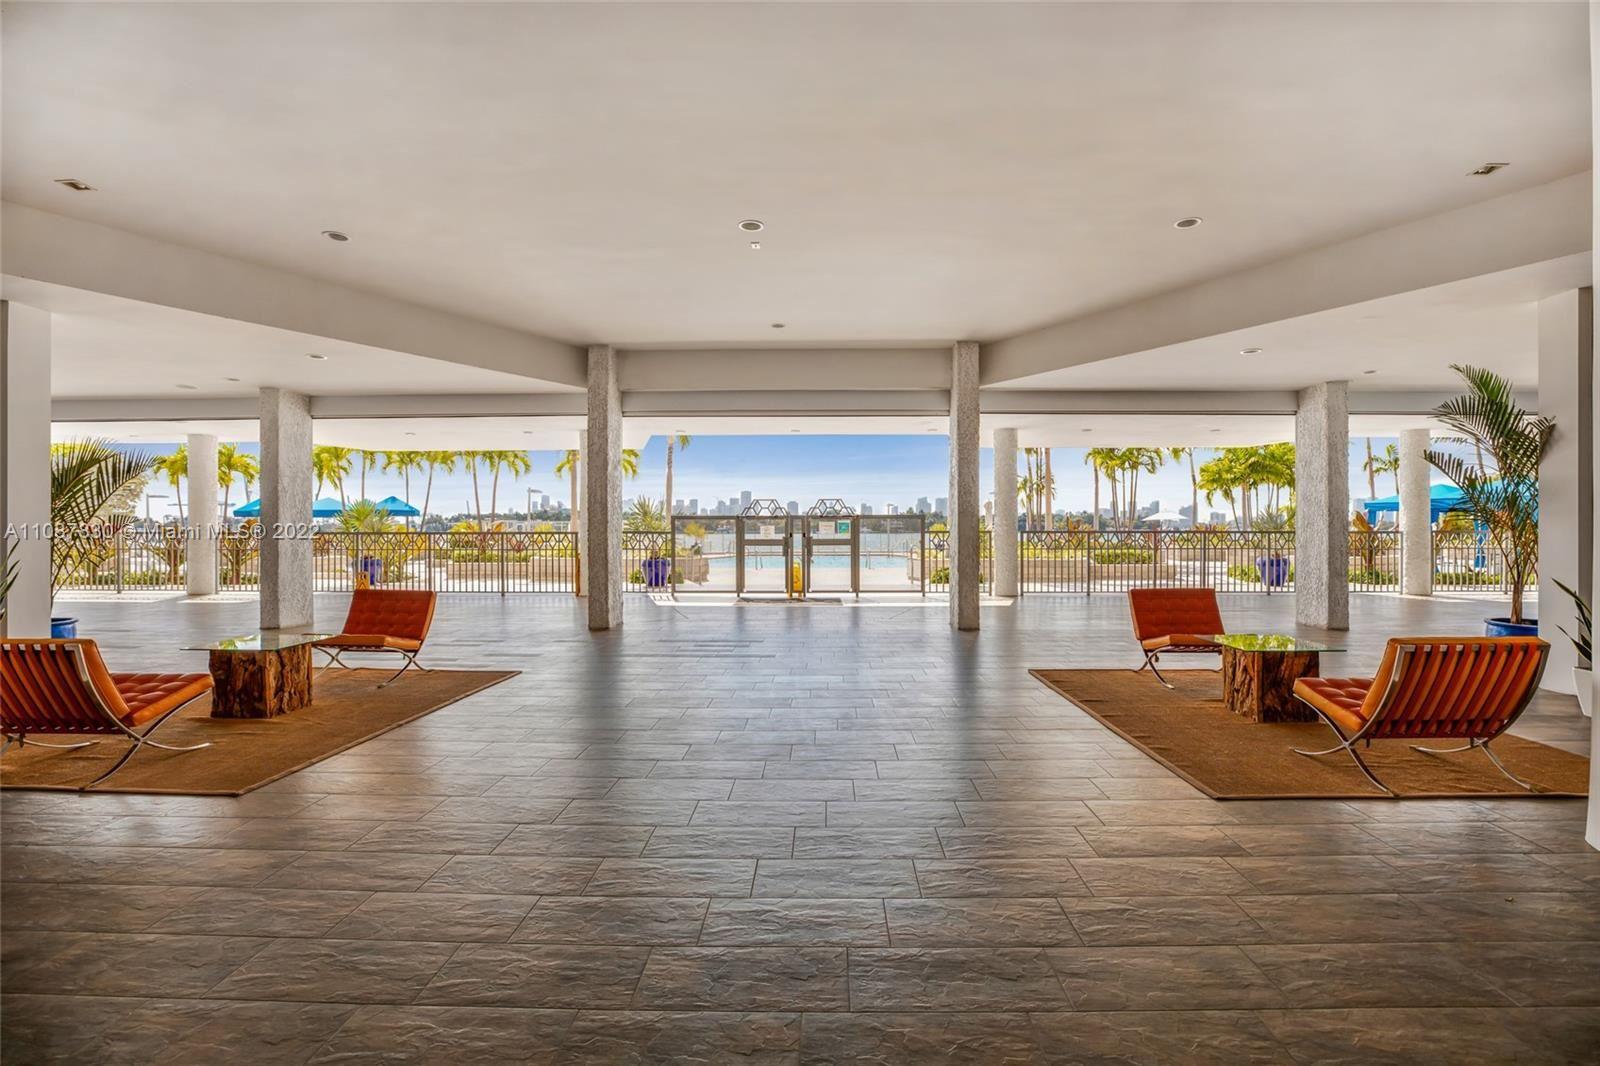 800 West Ave #201, Miami Beach, FL 33139 - #: A11087830